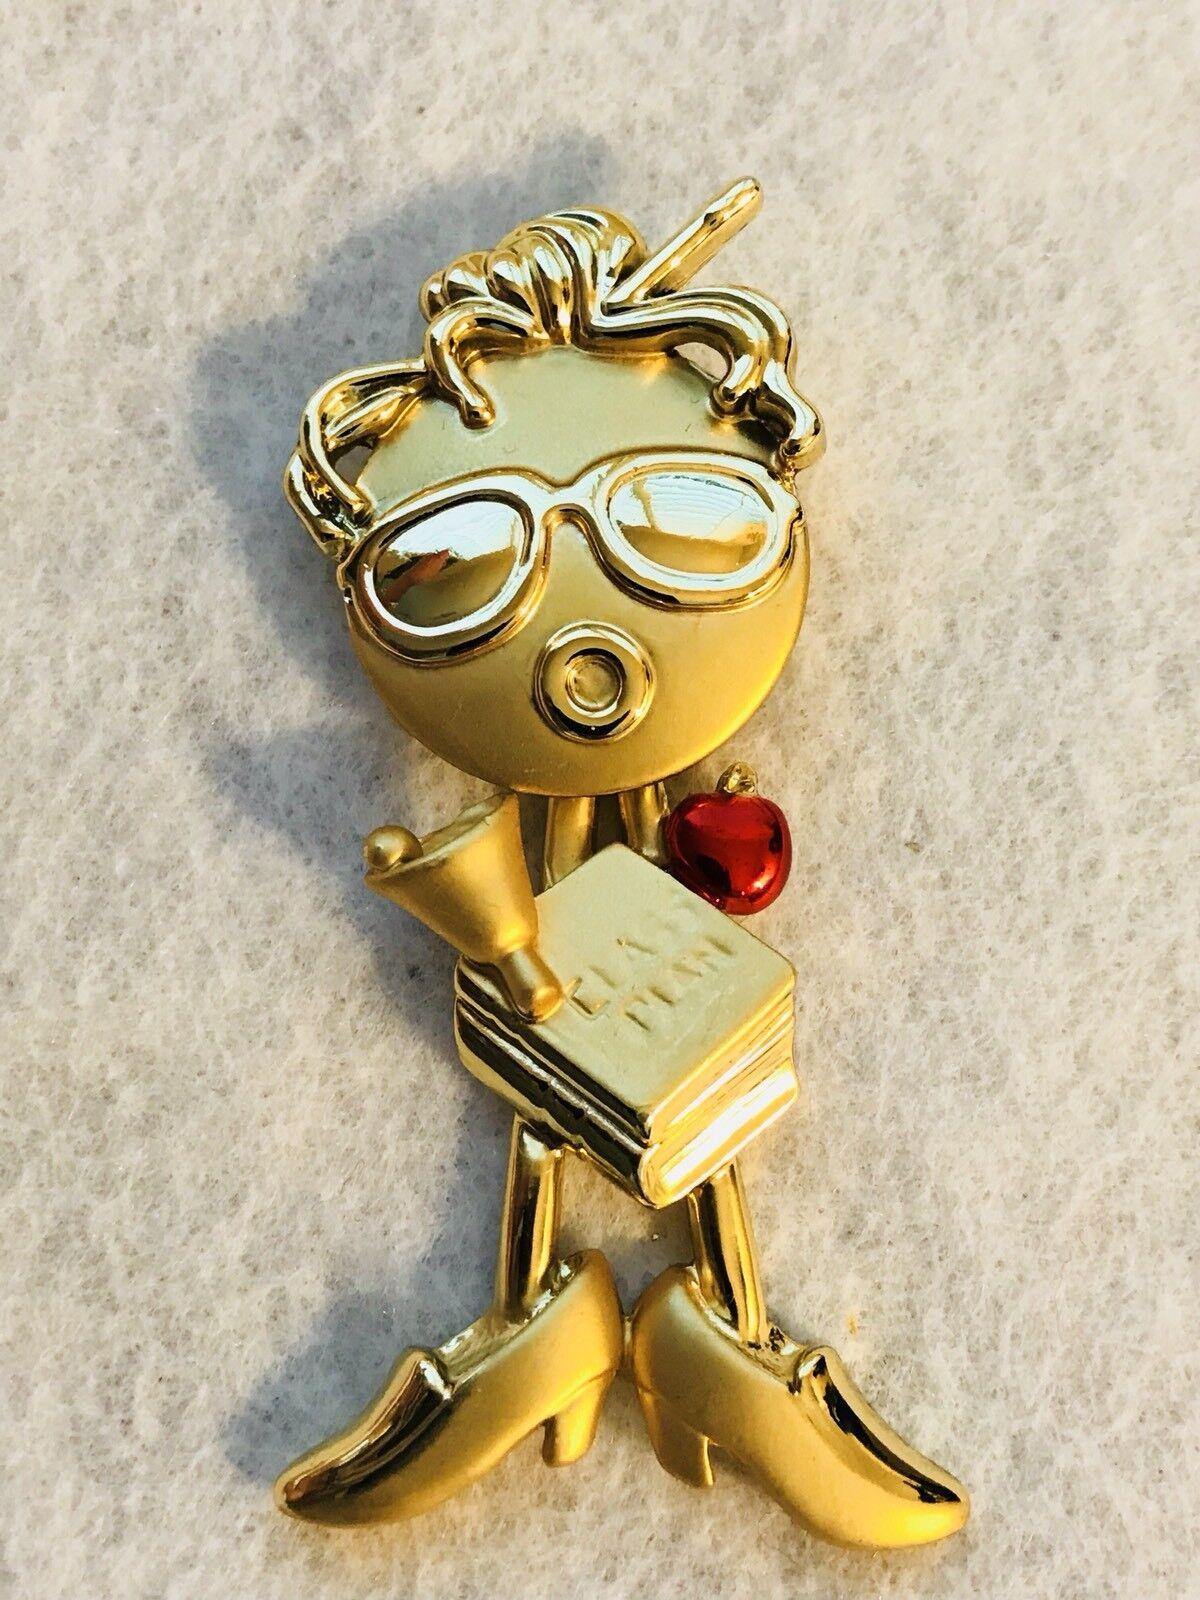 Vintage Signed AJC Brushed gold Tone Teacher w Apple Pendulum Brooch Pin RARE